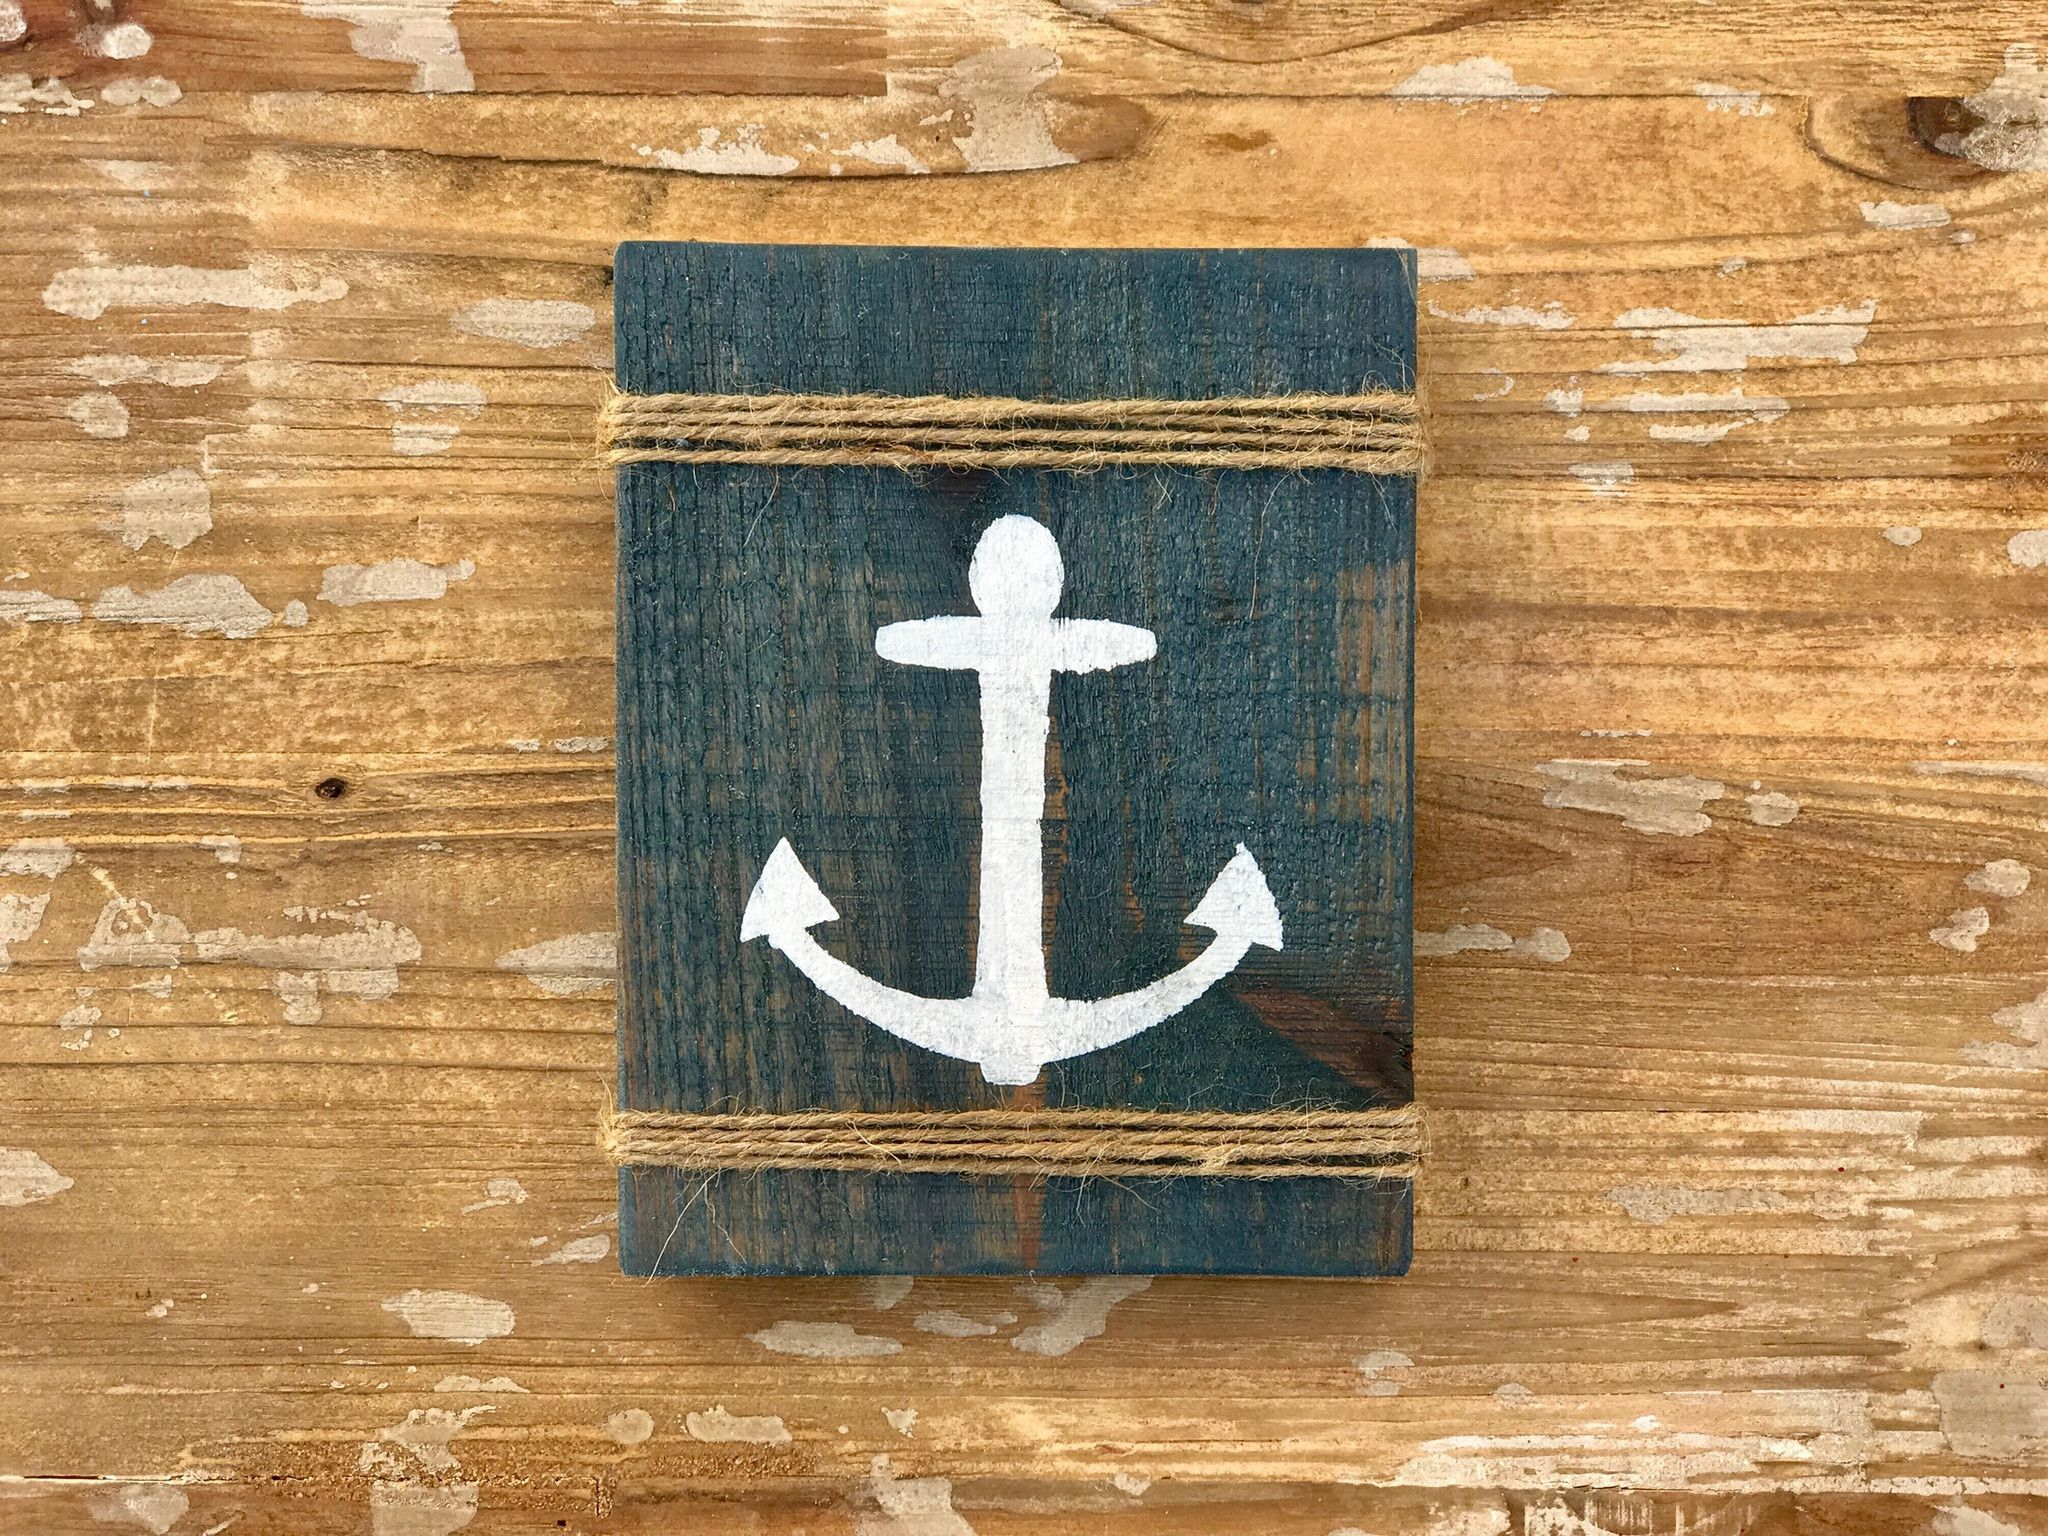 Strand badezimmer dekor diy anchor sign with twine jute rope beach house decor rustic beach